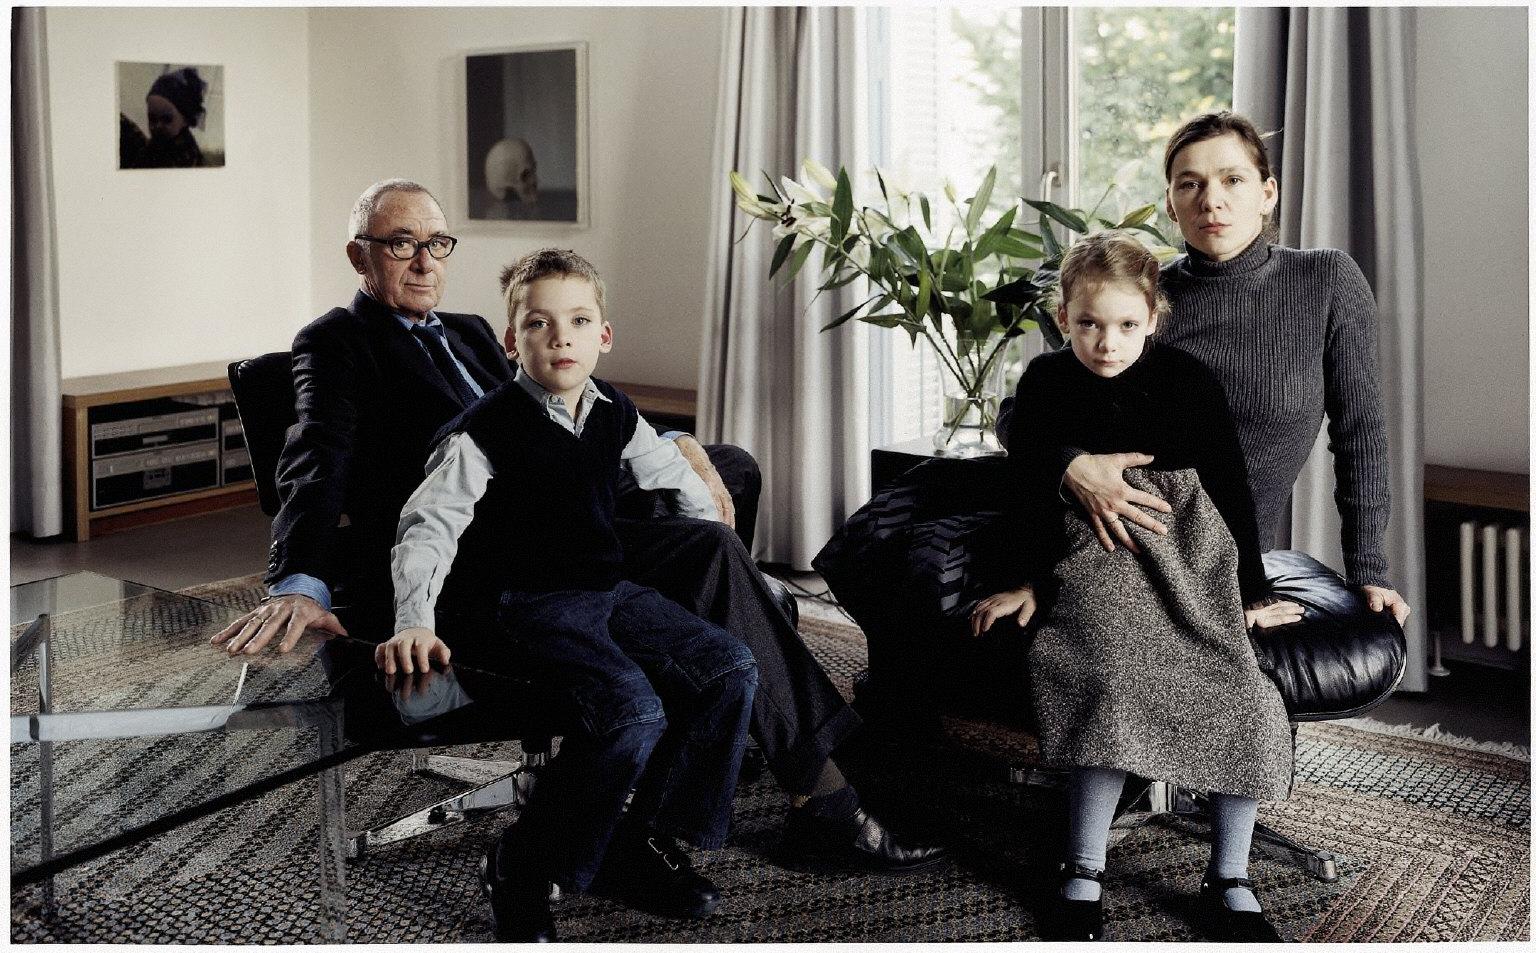 The Richter Family 1, Cologne